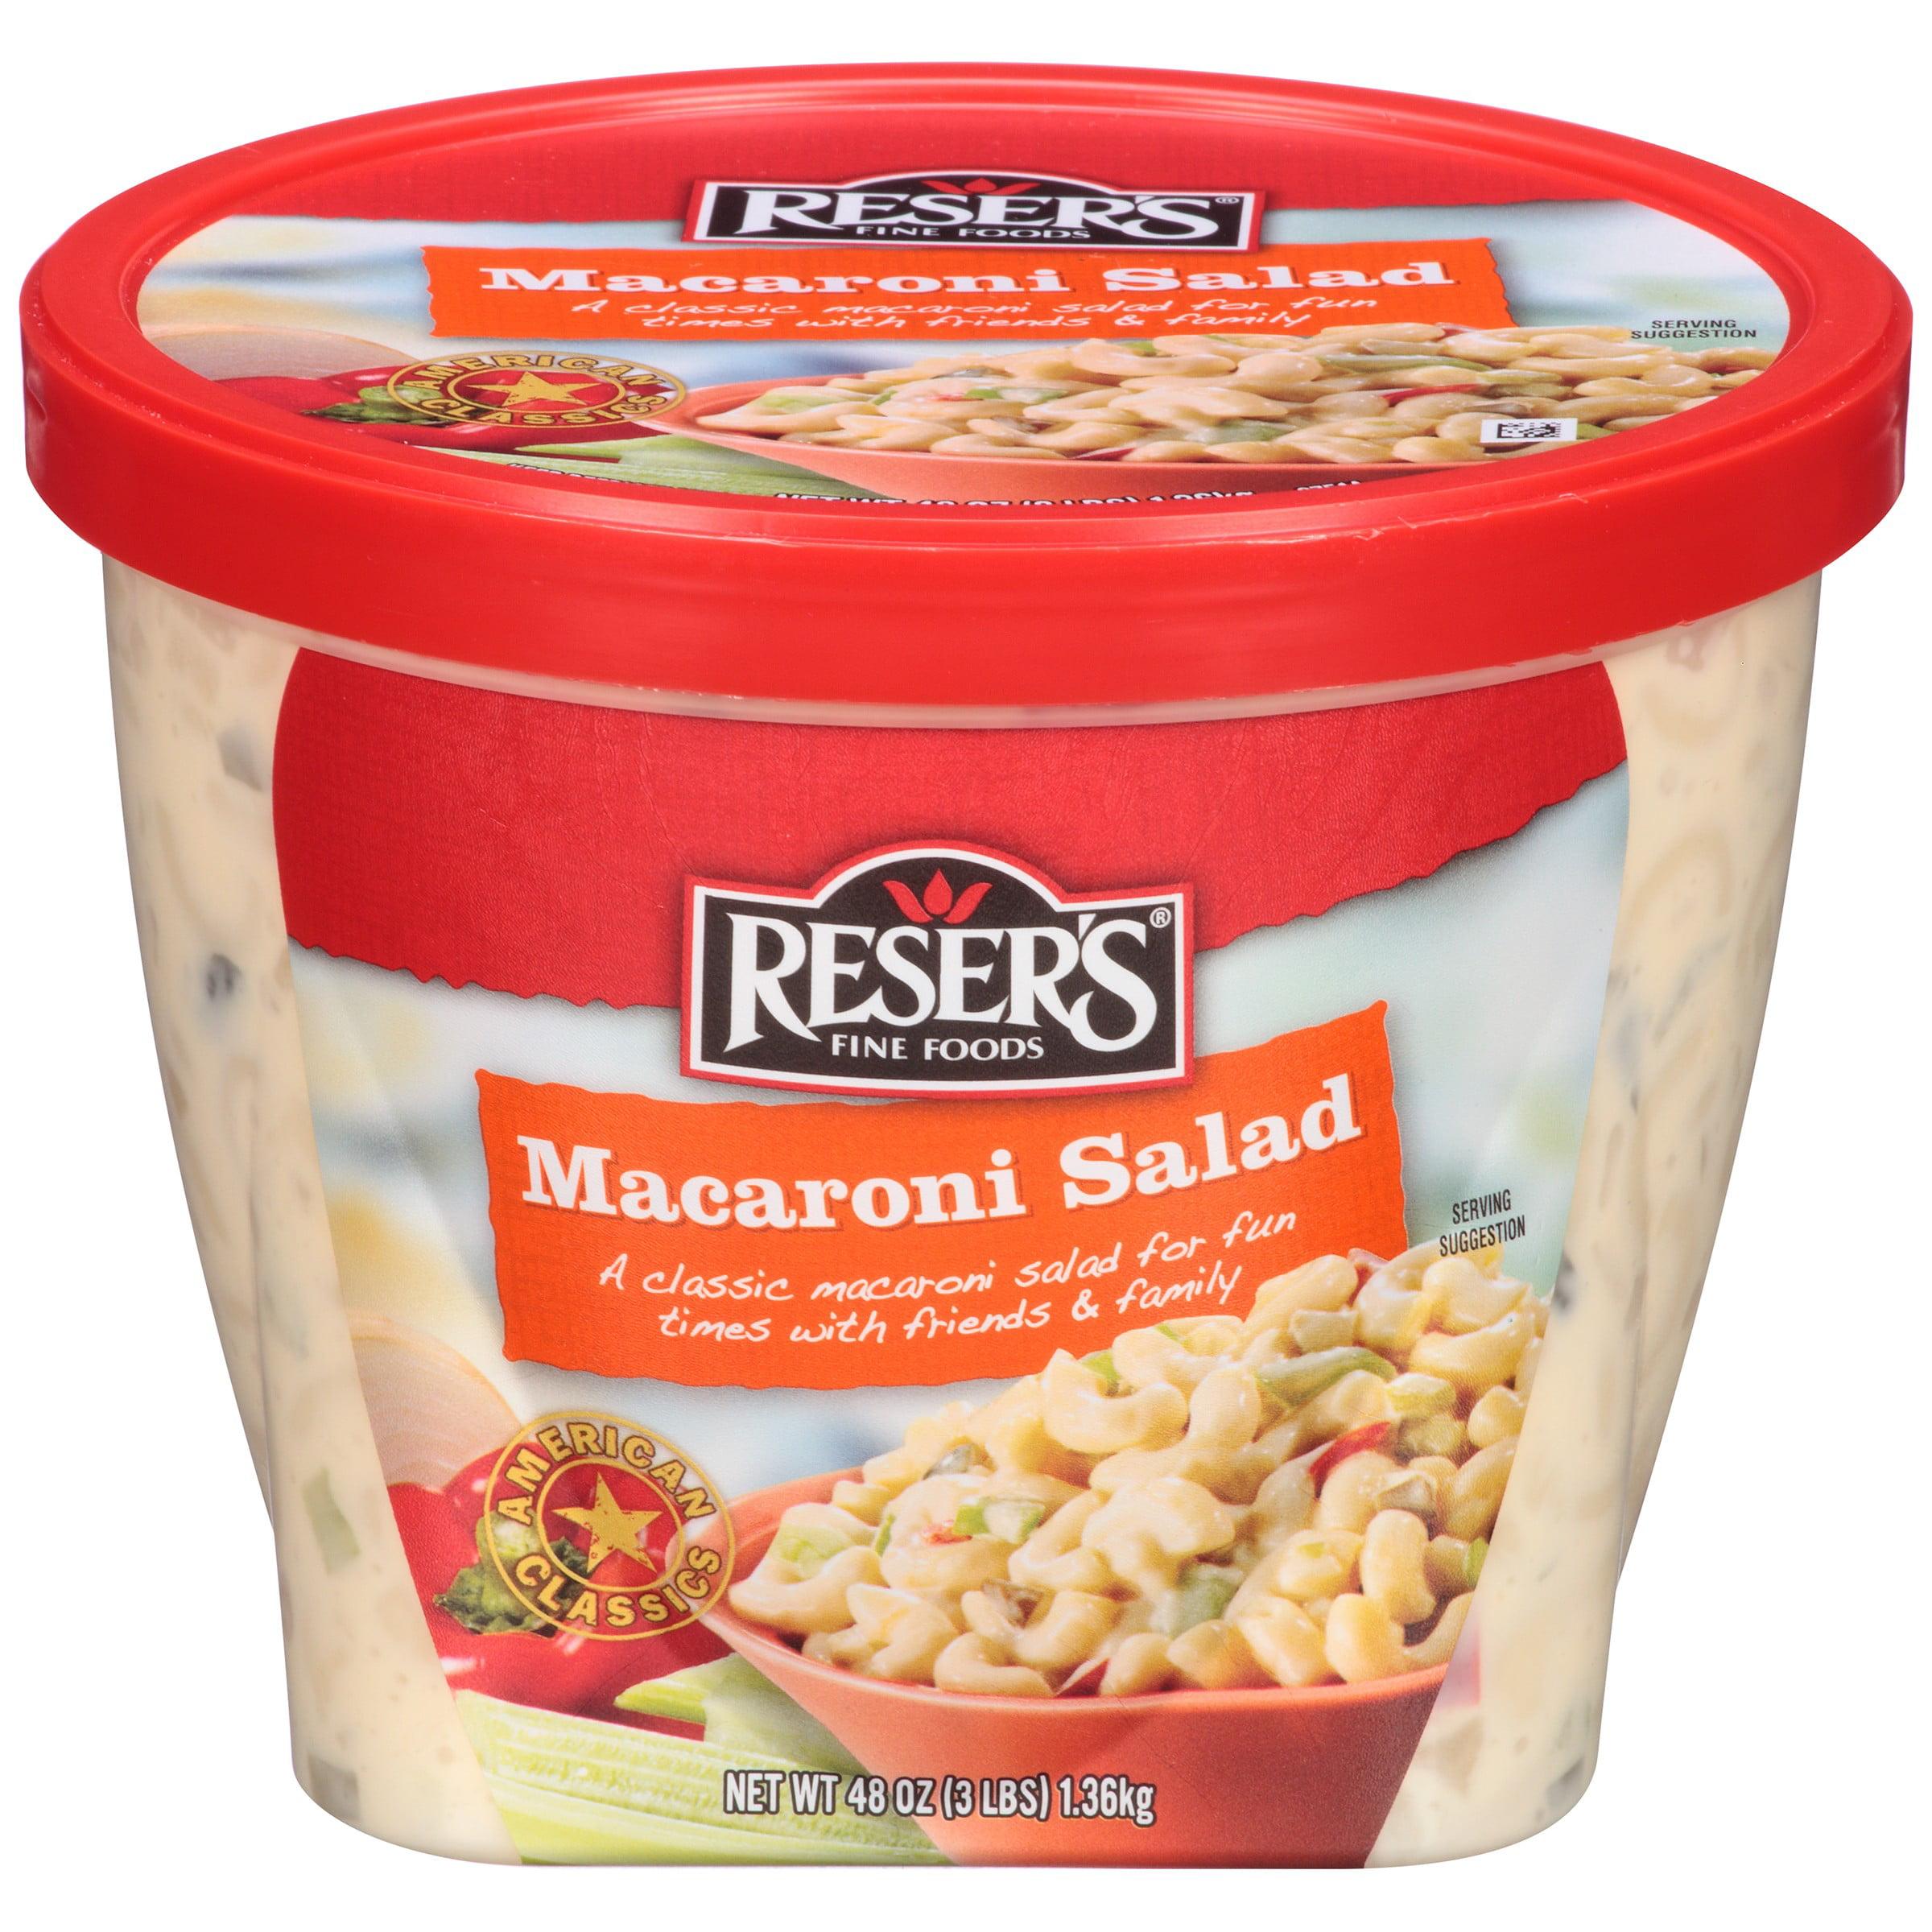 Reser's Fine Foods® Macaroni Salad 48 oz. Tub